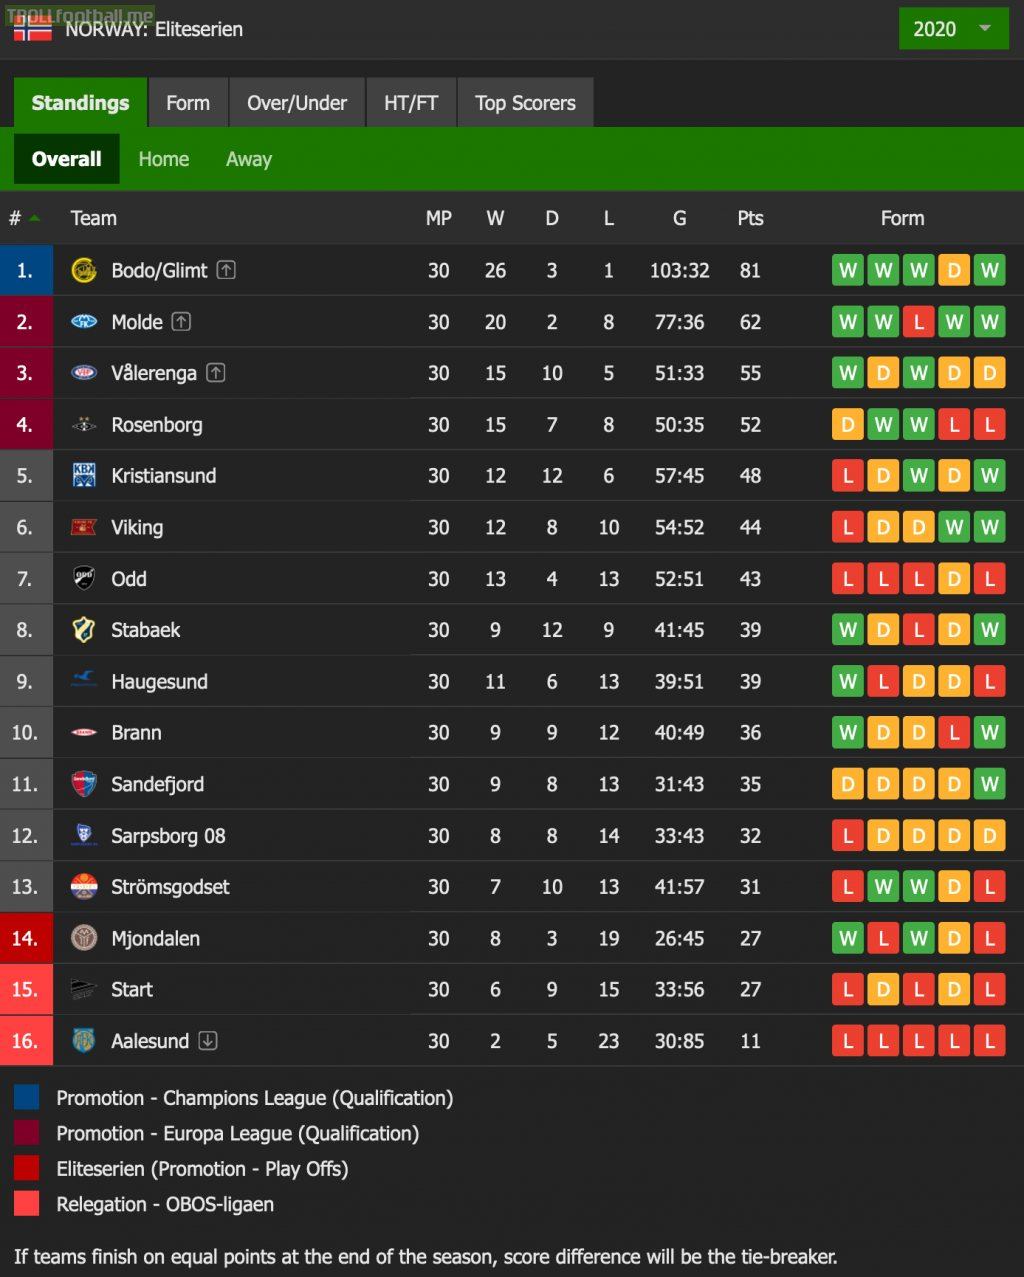 2020 Eliteserien Final Standings - Bodø/Glimt champions + Champions League qual.; Molde, Vålerenga, Rosenborg Conference League qual.; Mjøndalen relegation playoff vs. Sogndal; Start, Aalesund relegated